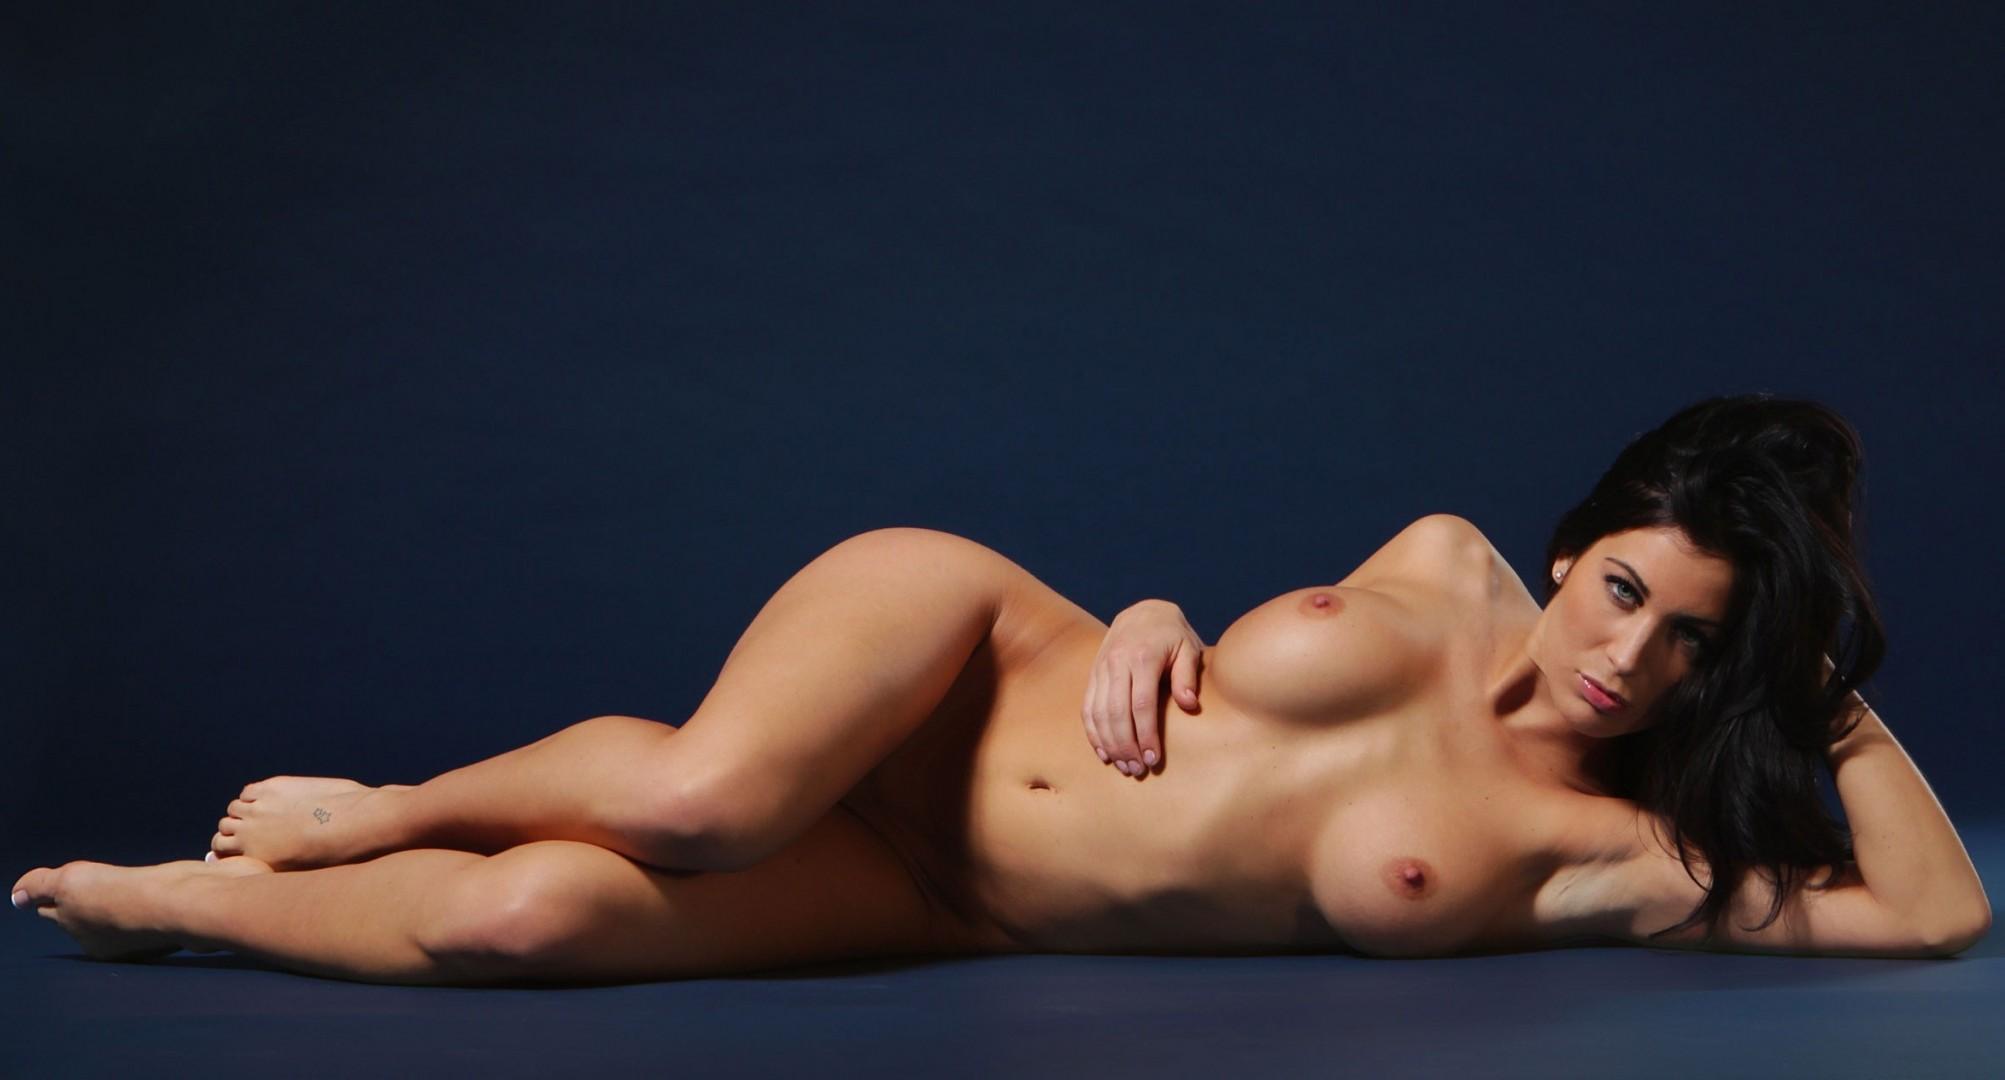 Rani's nude wallpapers